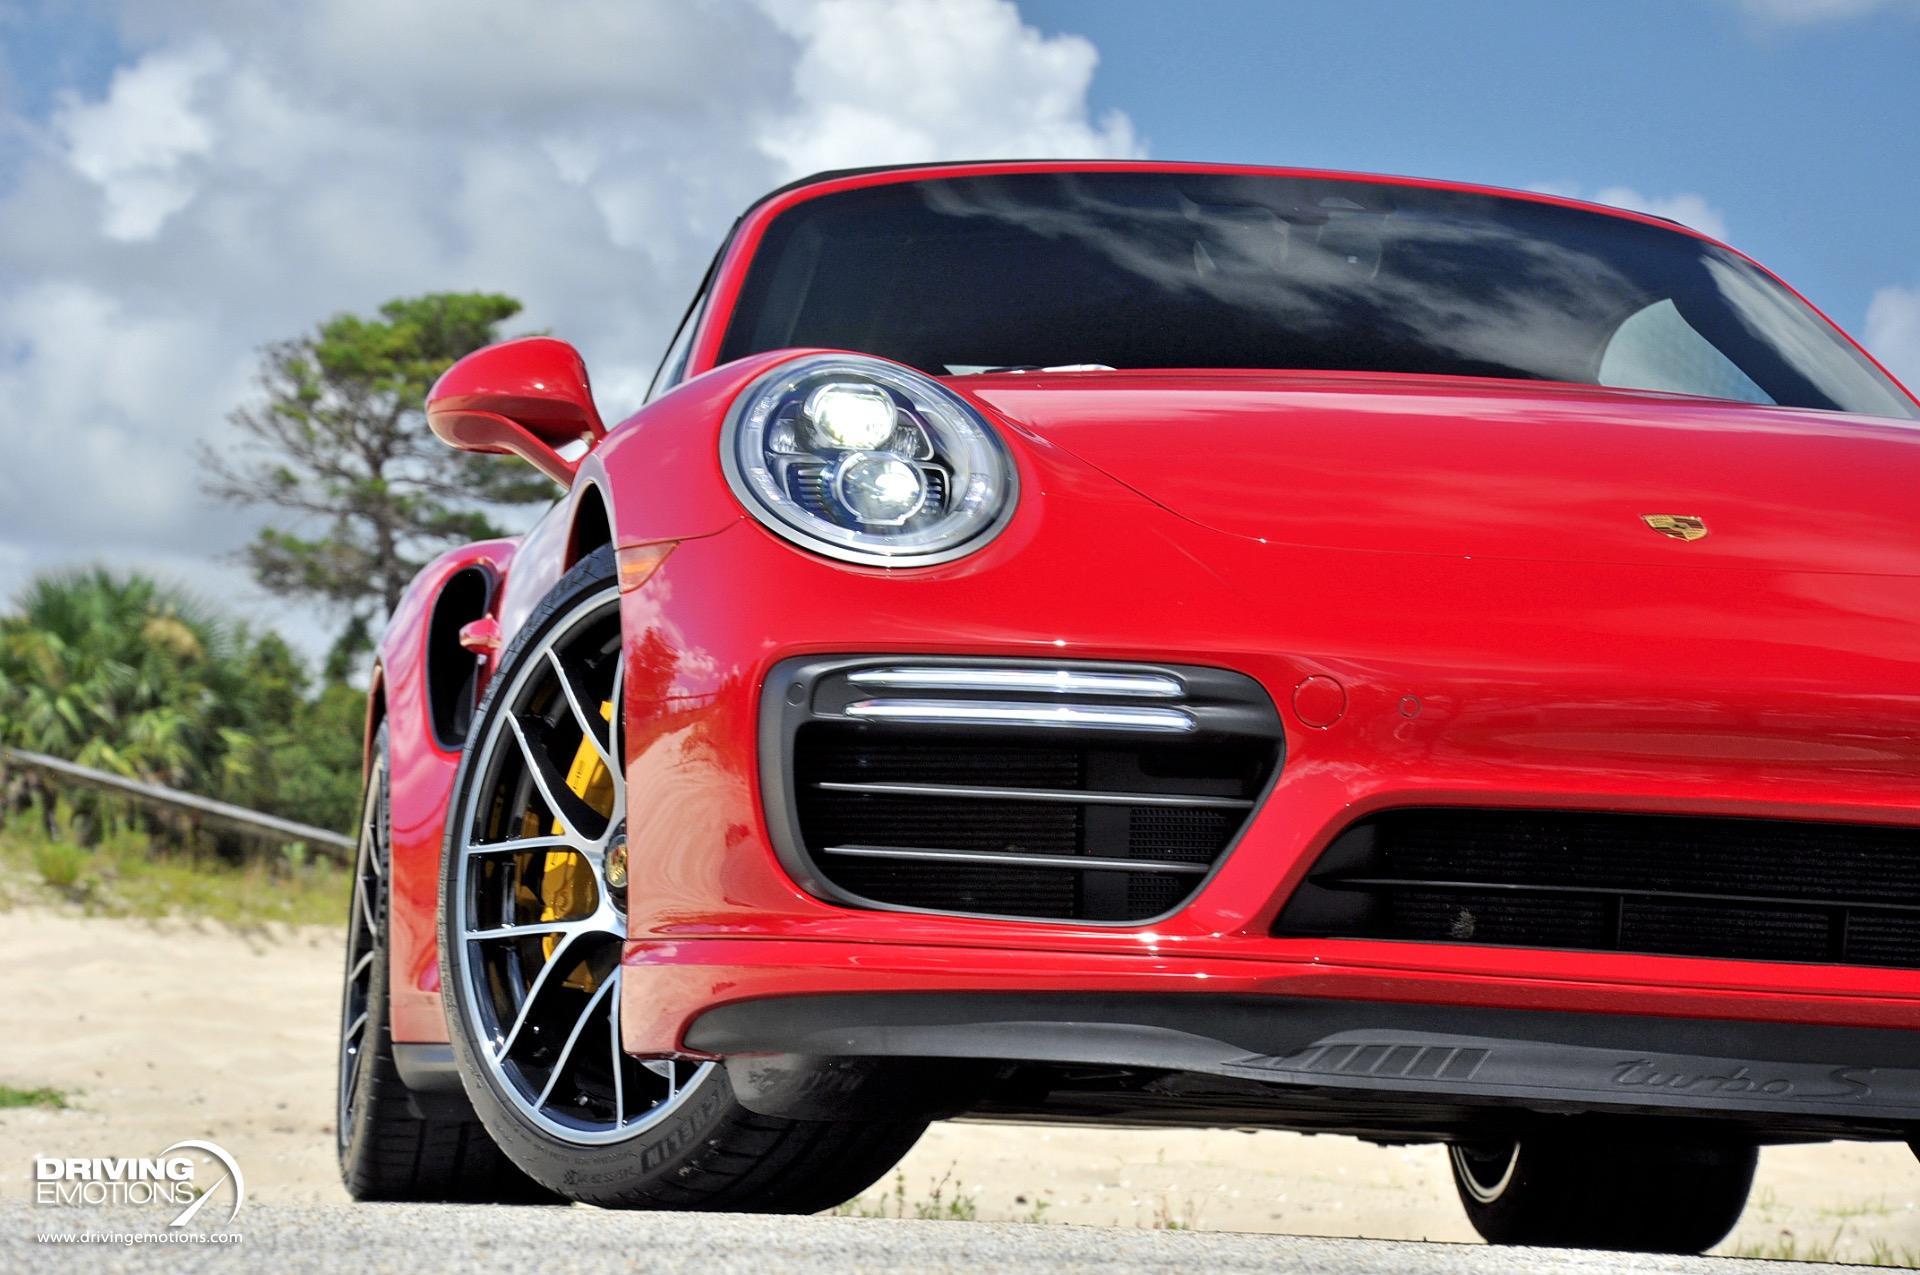 Used 2019 Porsche 911 Turbo S Cabriolet Turbo S Cabriolet $217K MSRP!! | Lake Park, FL